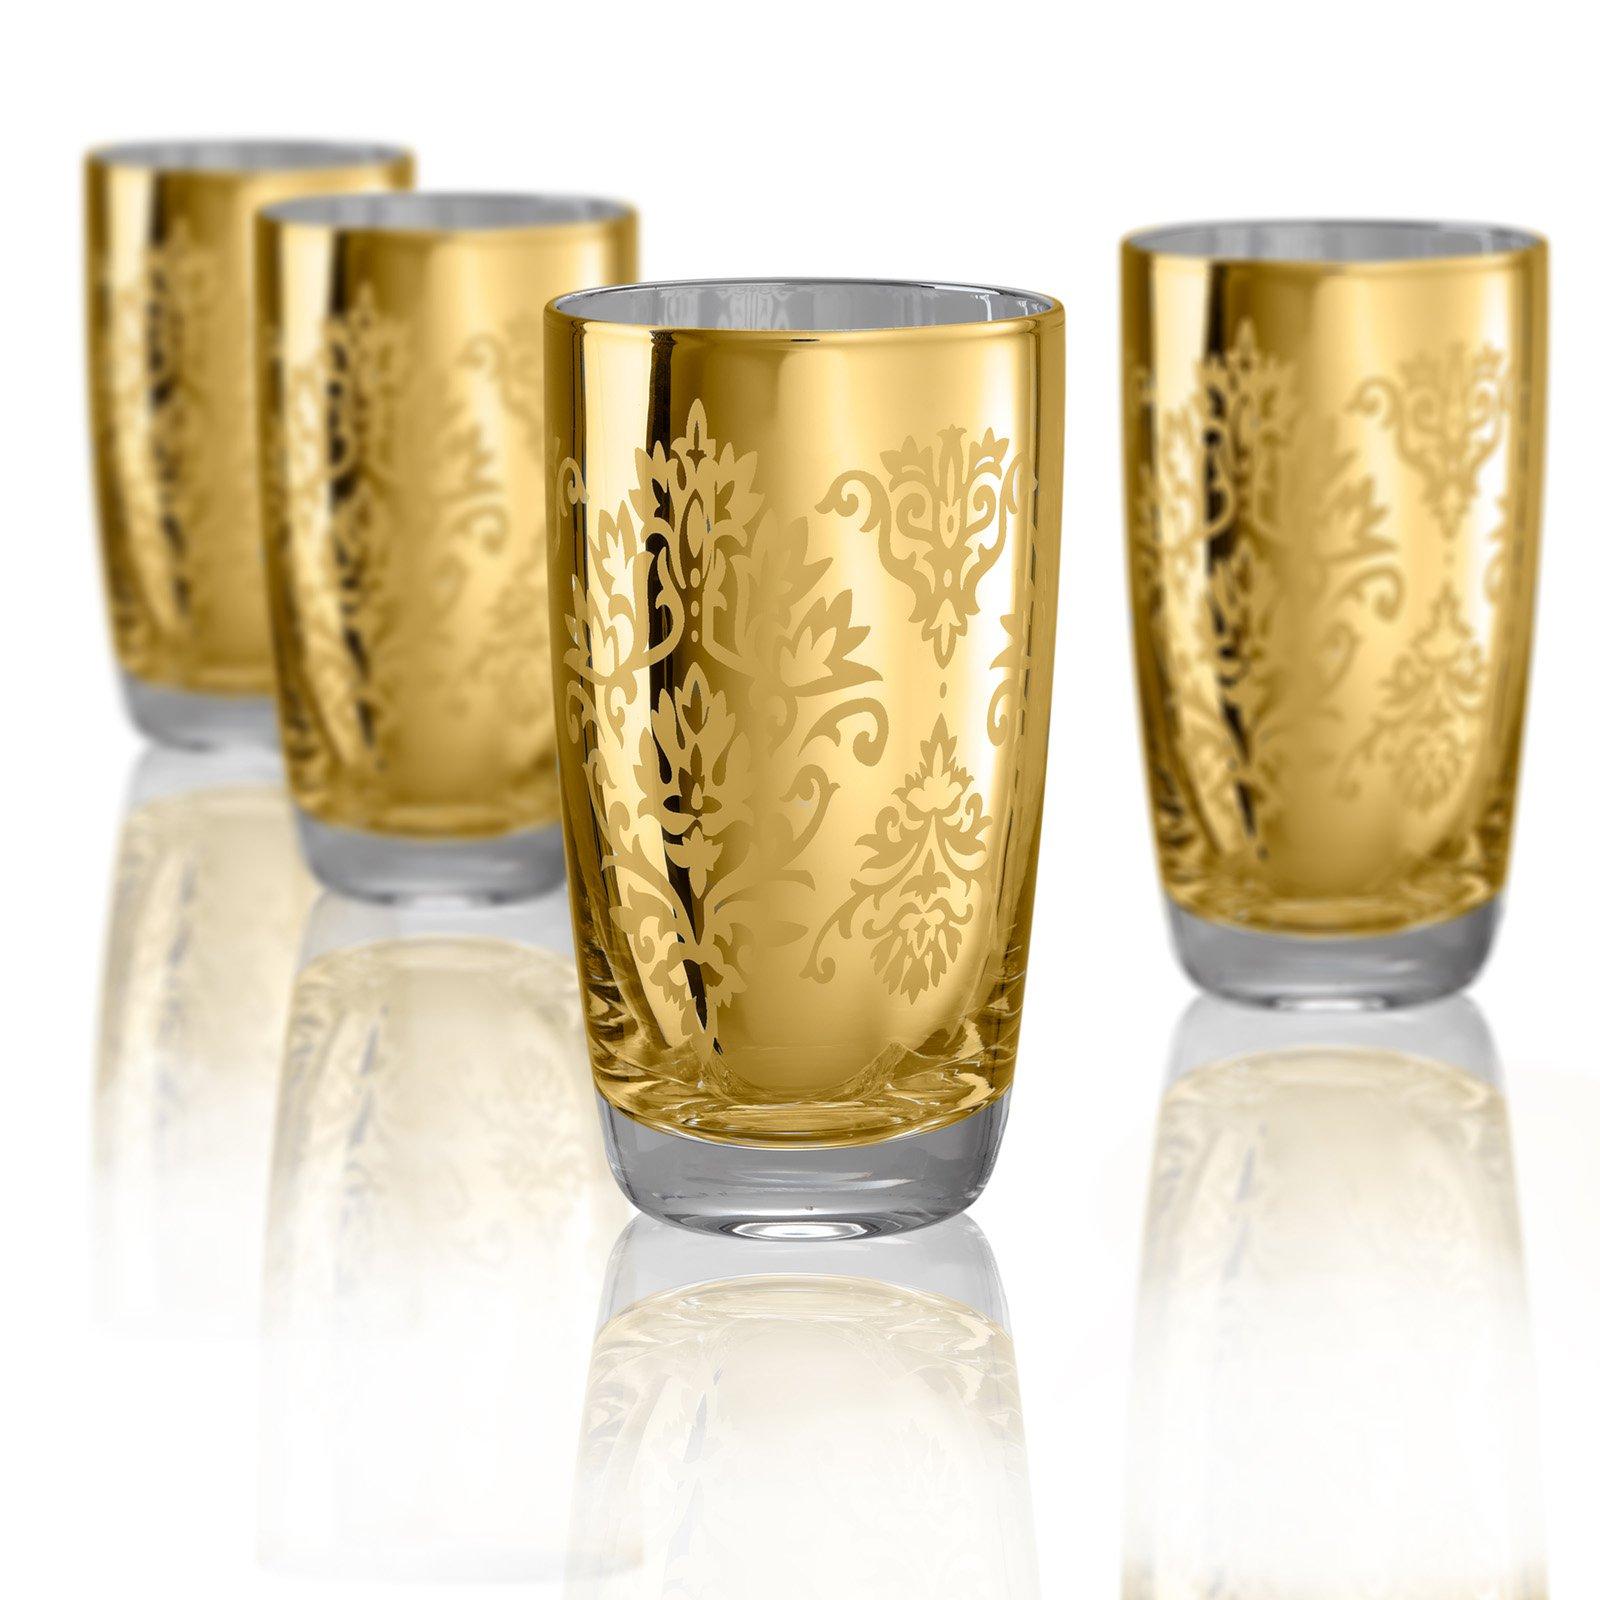 Artland Inc. Silver Brocade HiBall Glasses - Set of 4